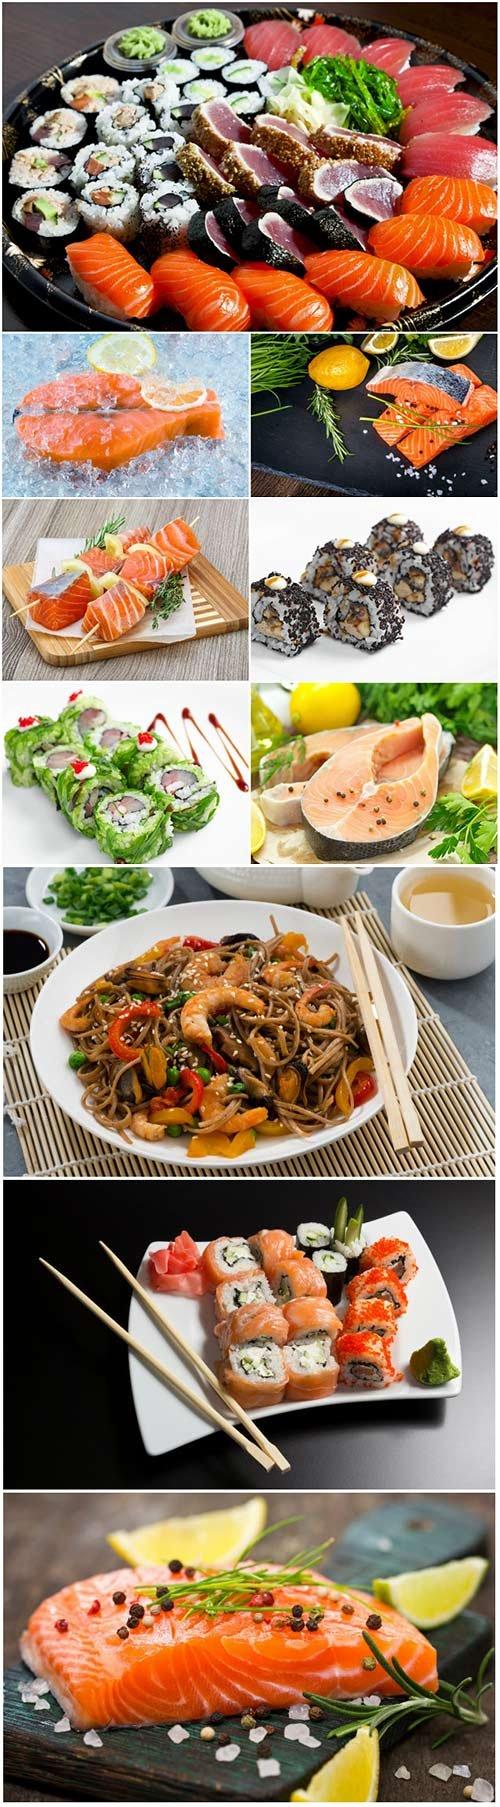 Delicious seafood, salmon, sushi, shrimp